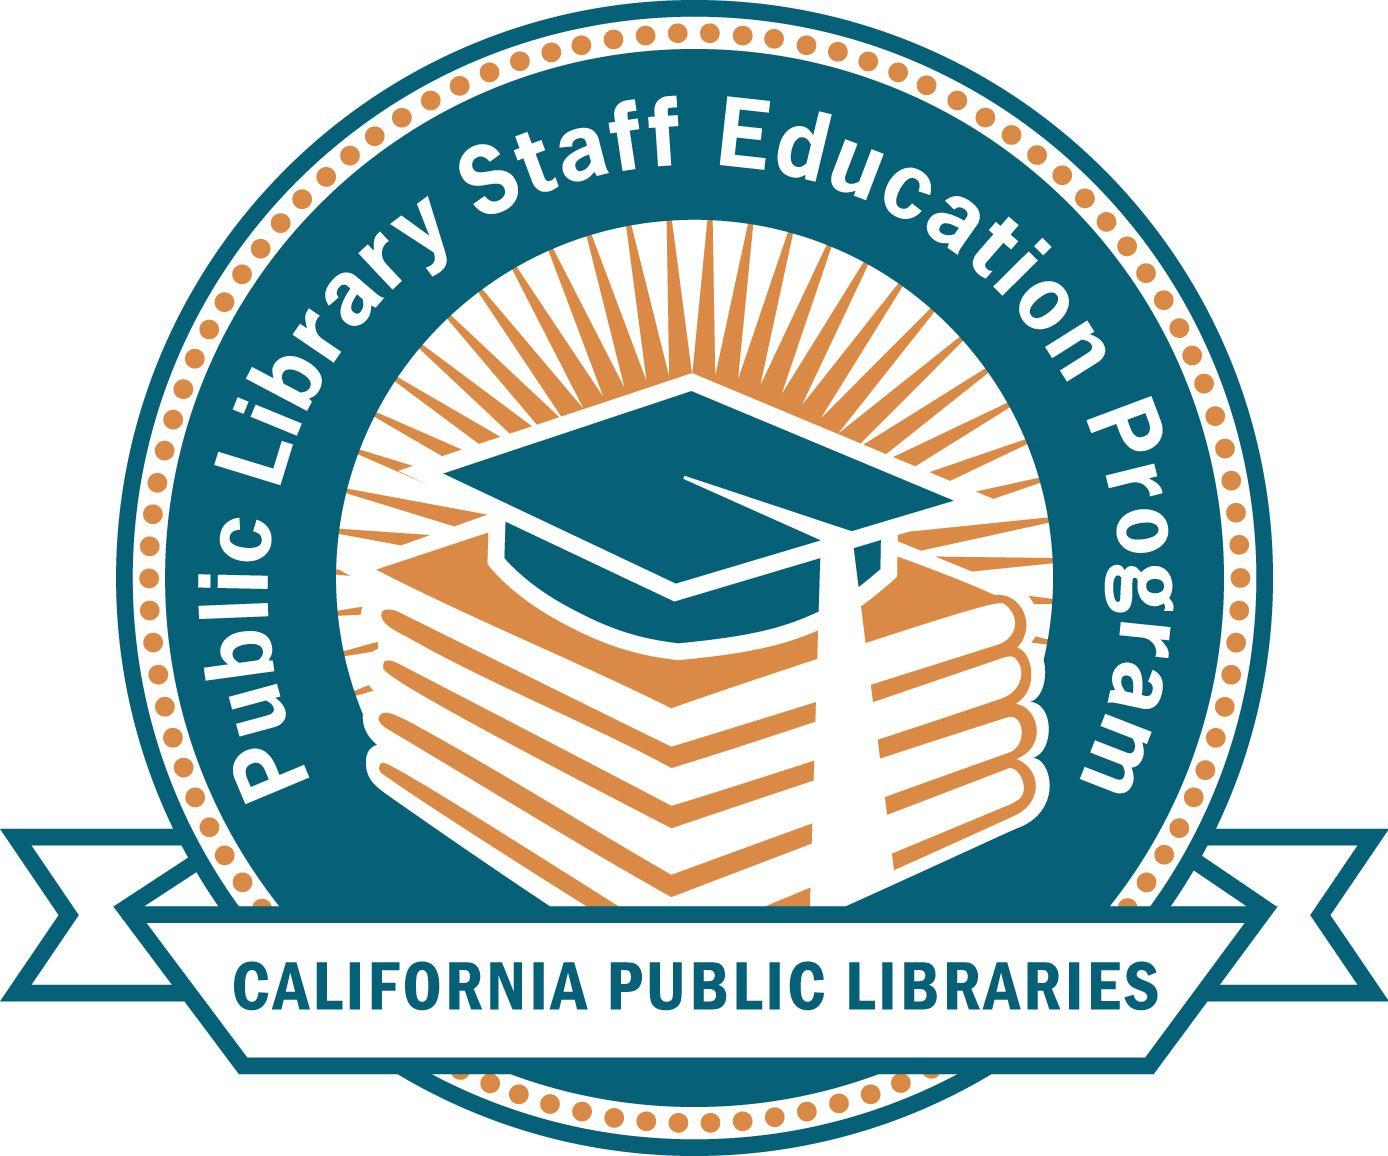 Public Library Staff Education Program Is A Competitive Tuition Reimbursement Program Developed To Assist Cali Staff Education Library Services Library Science